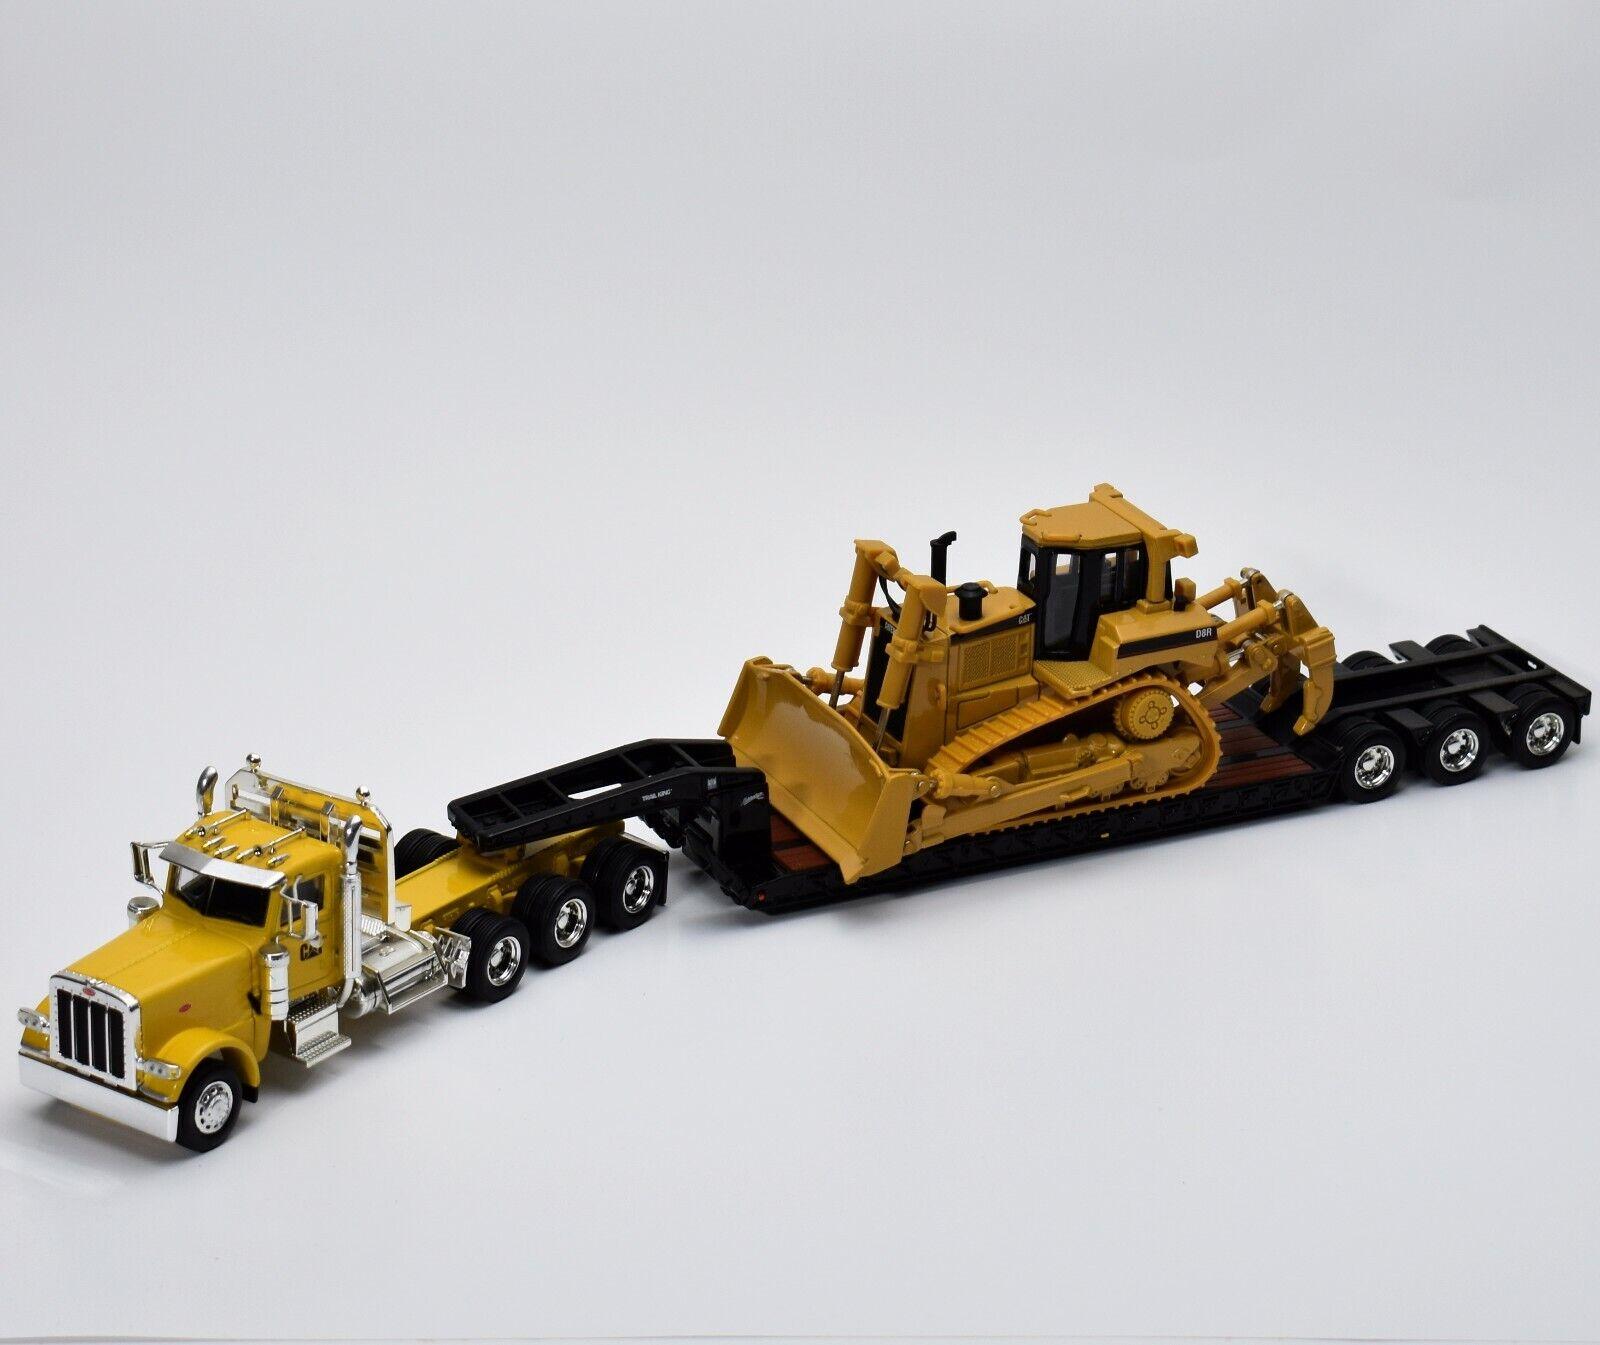 Rarit t Norscot 55207 CAT Peterbit 389 Truck glidasflinder Cateplarvar, 1 50, S003